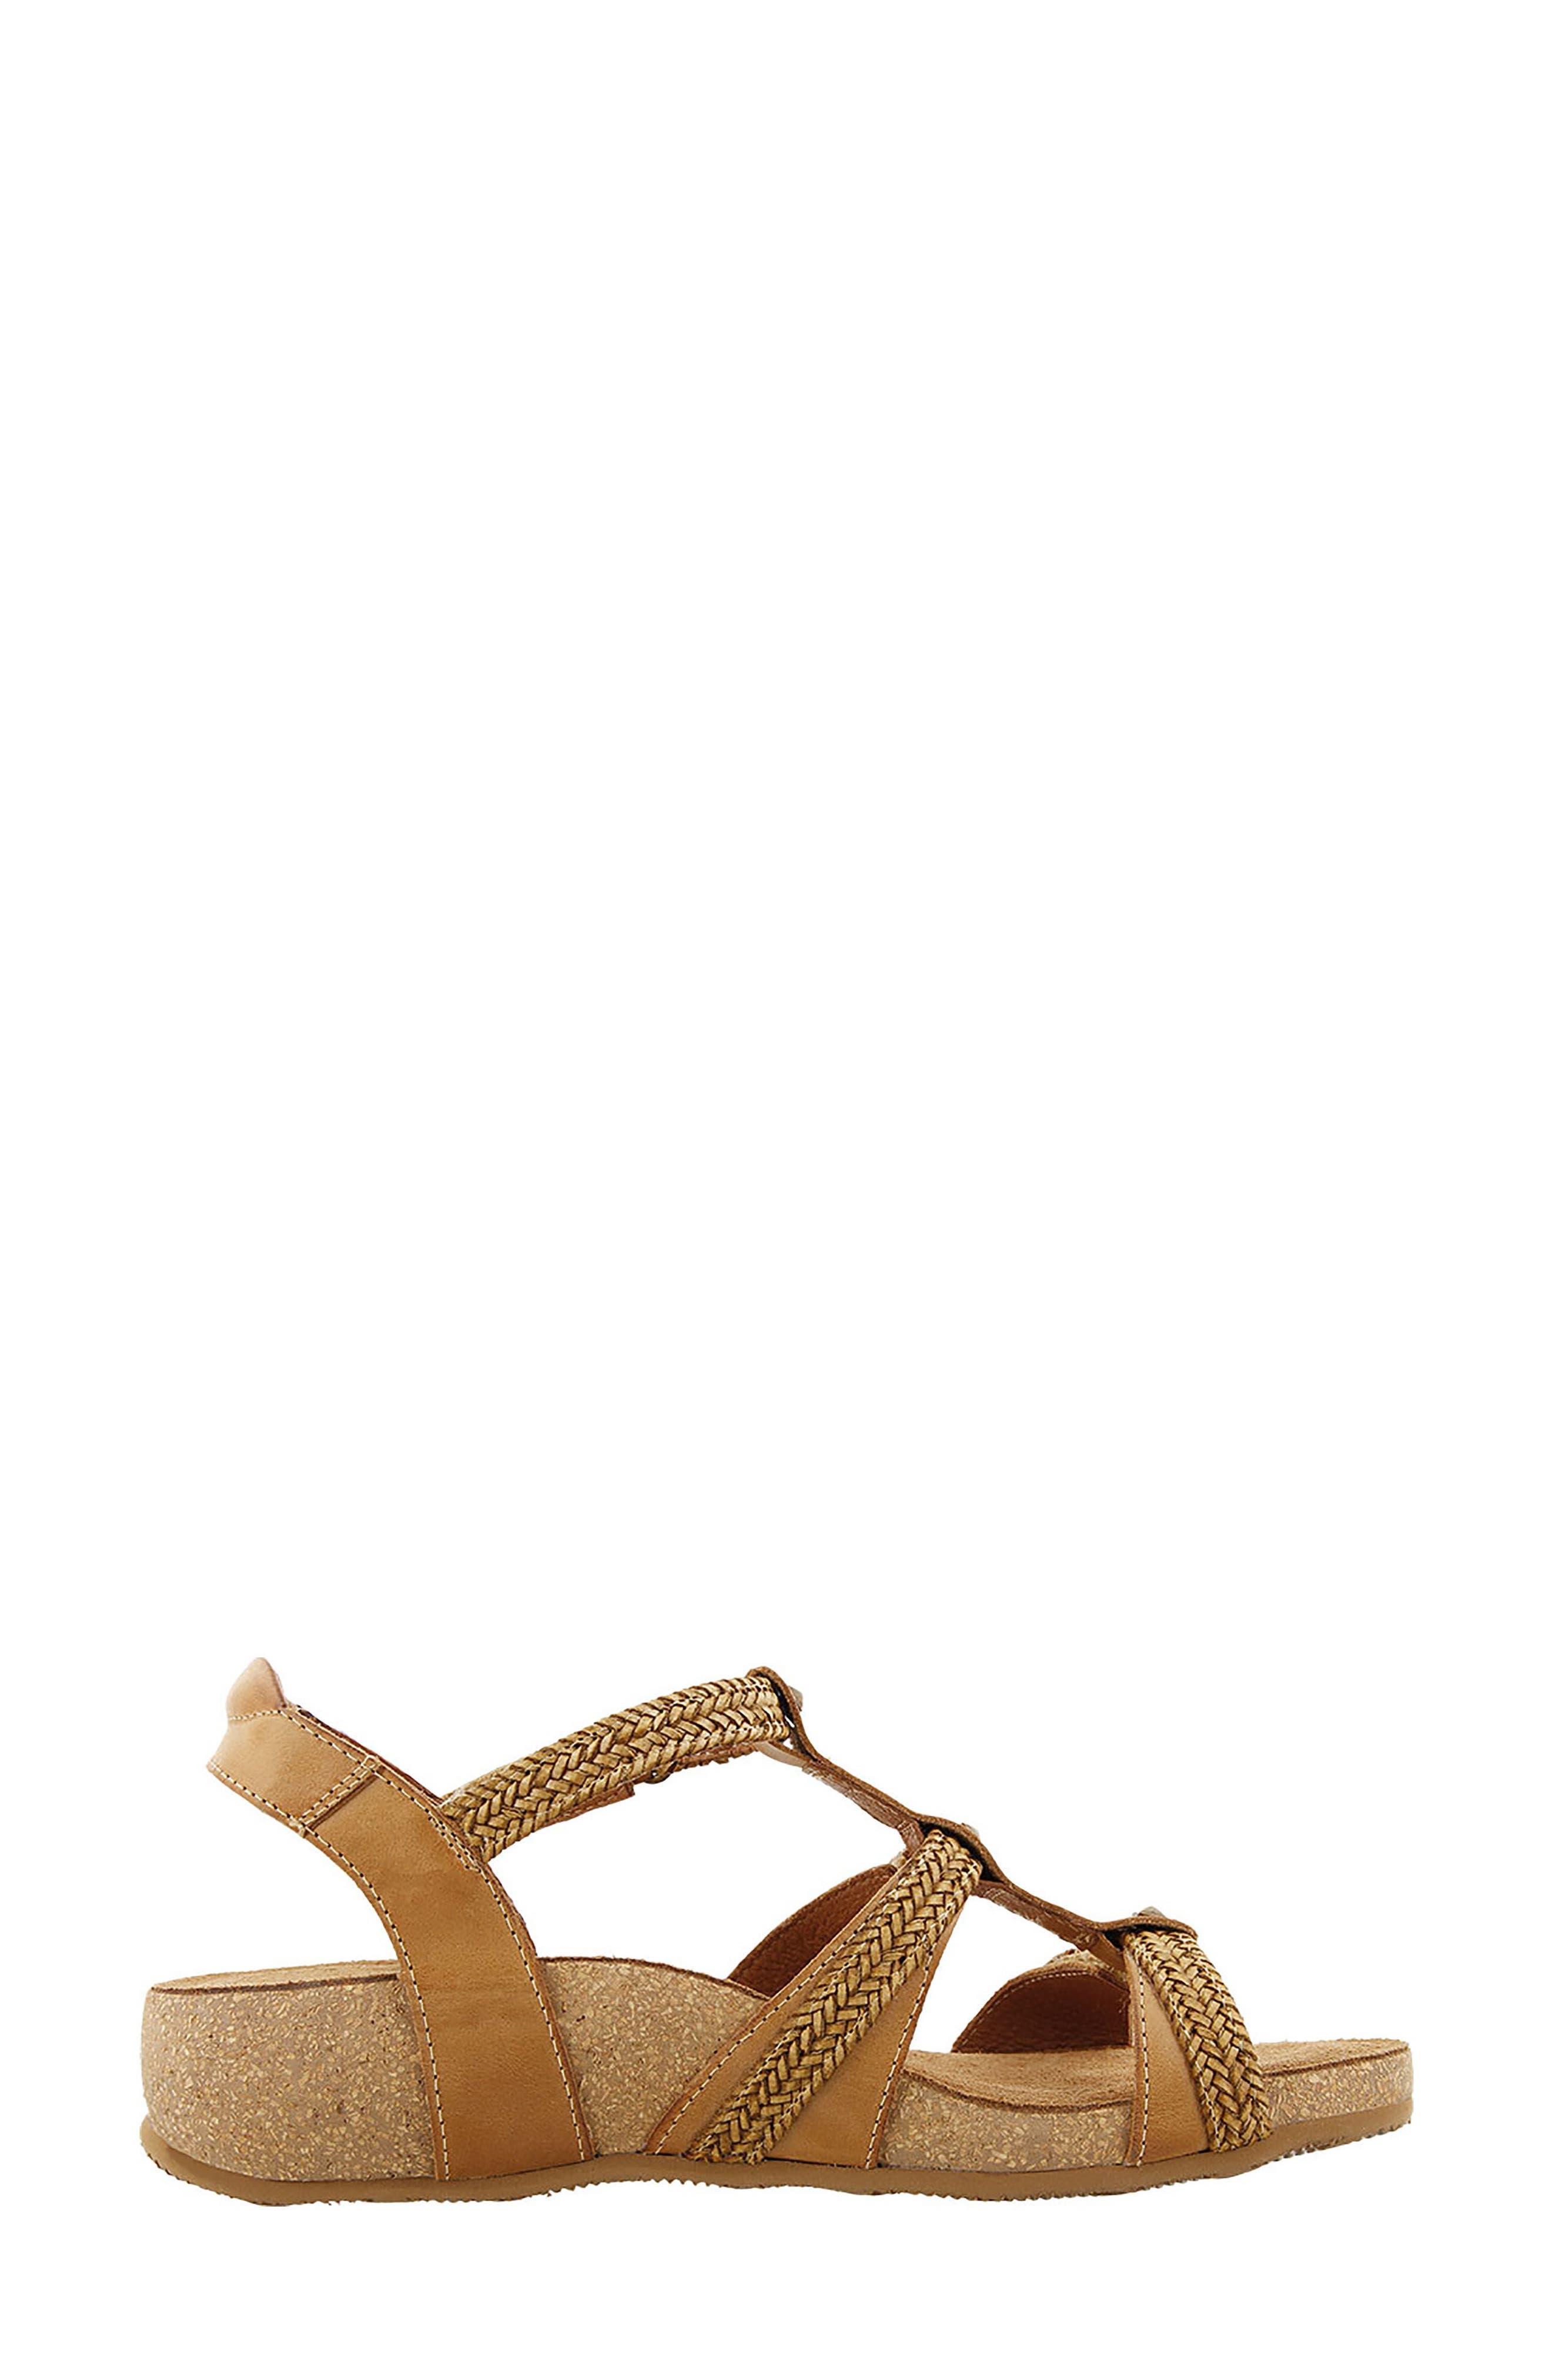 Eleanor Sandal,                             Alternate thumbnail 2, color,                             Camel Leather